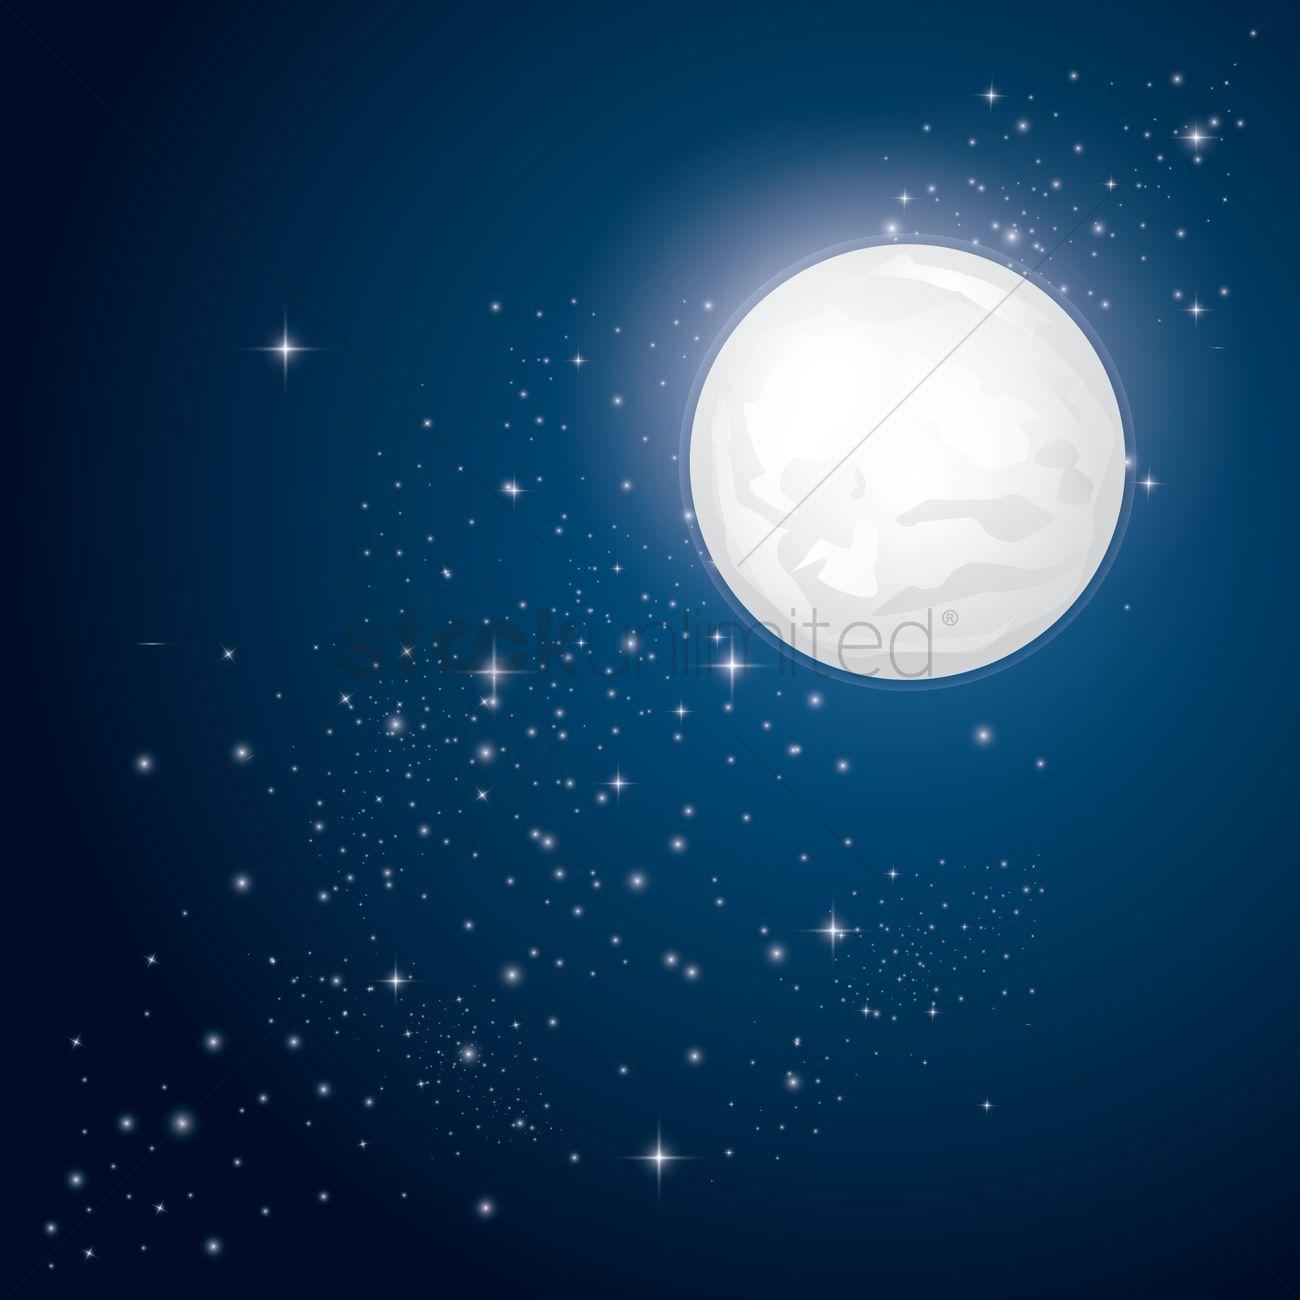 Moon and stars background wallpapersafari